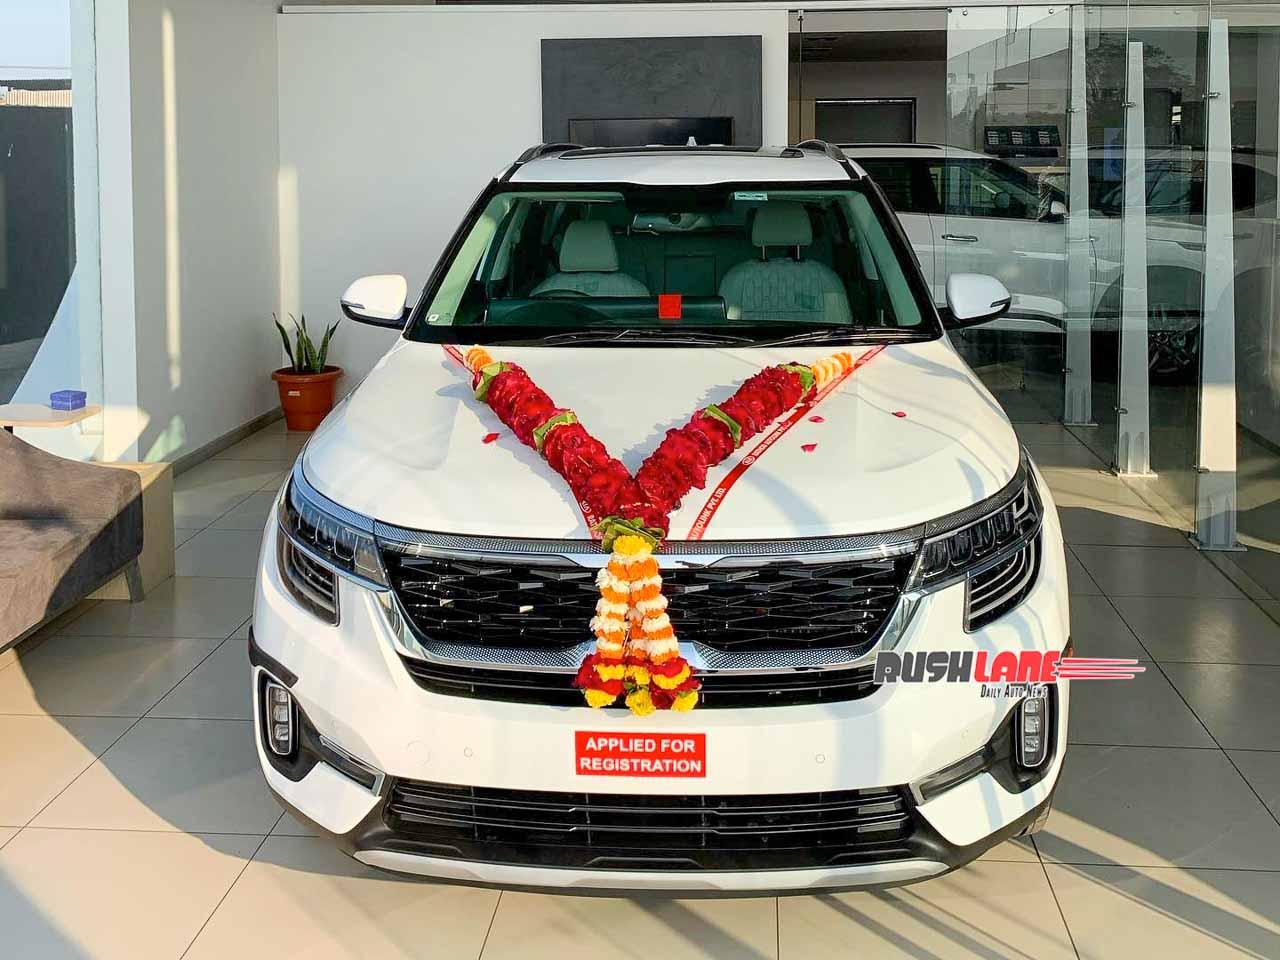 Seltos, Carnival help Kia become India's No 1 connected car brand